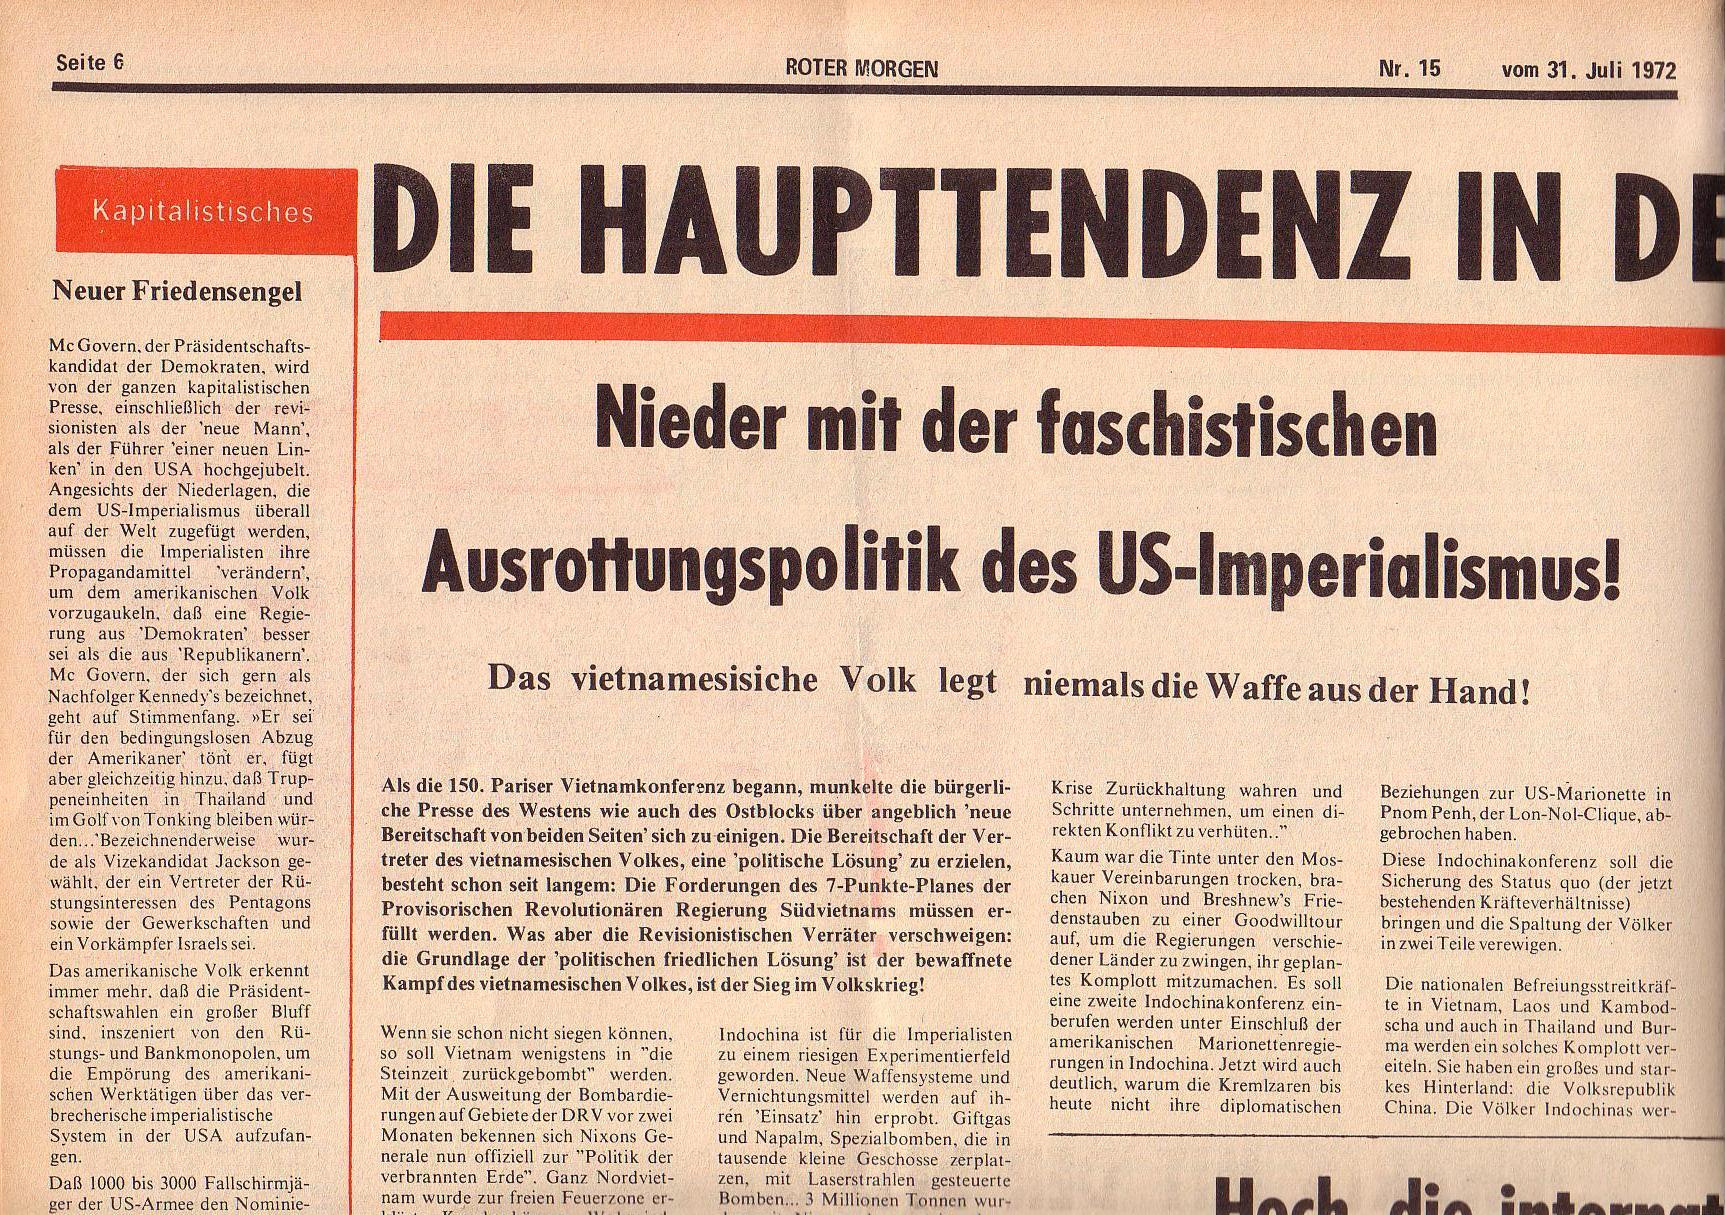 Roter Morgen, 6. Jg., 31. Juli 1972, Nr. 15, Seite 6a